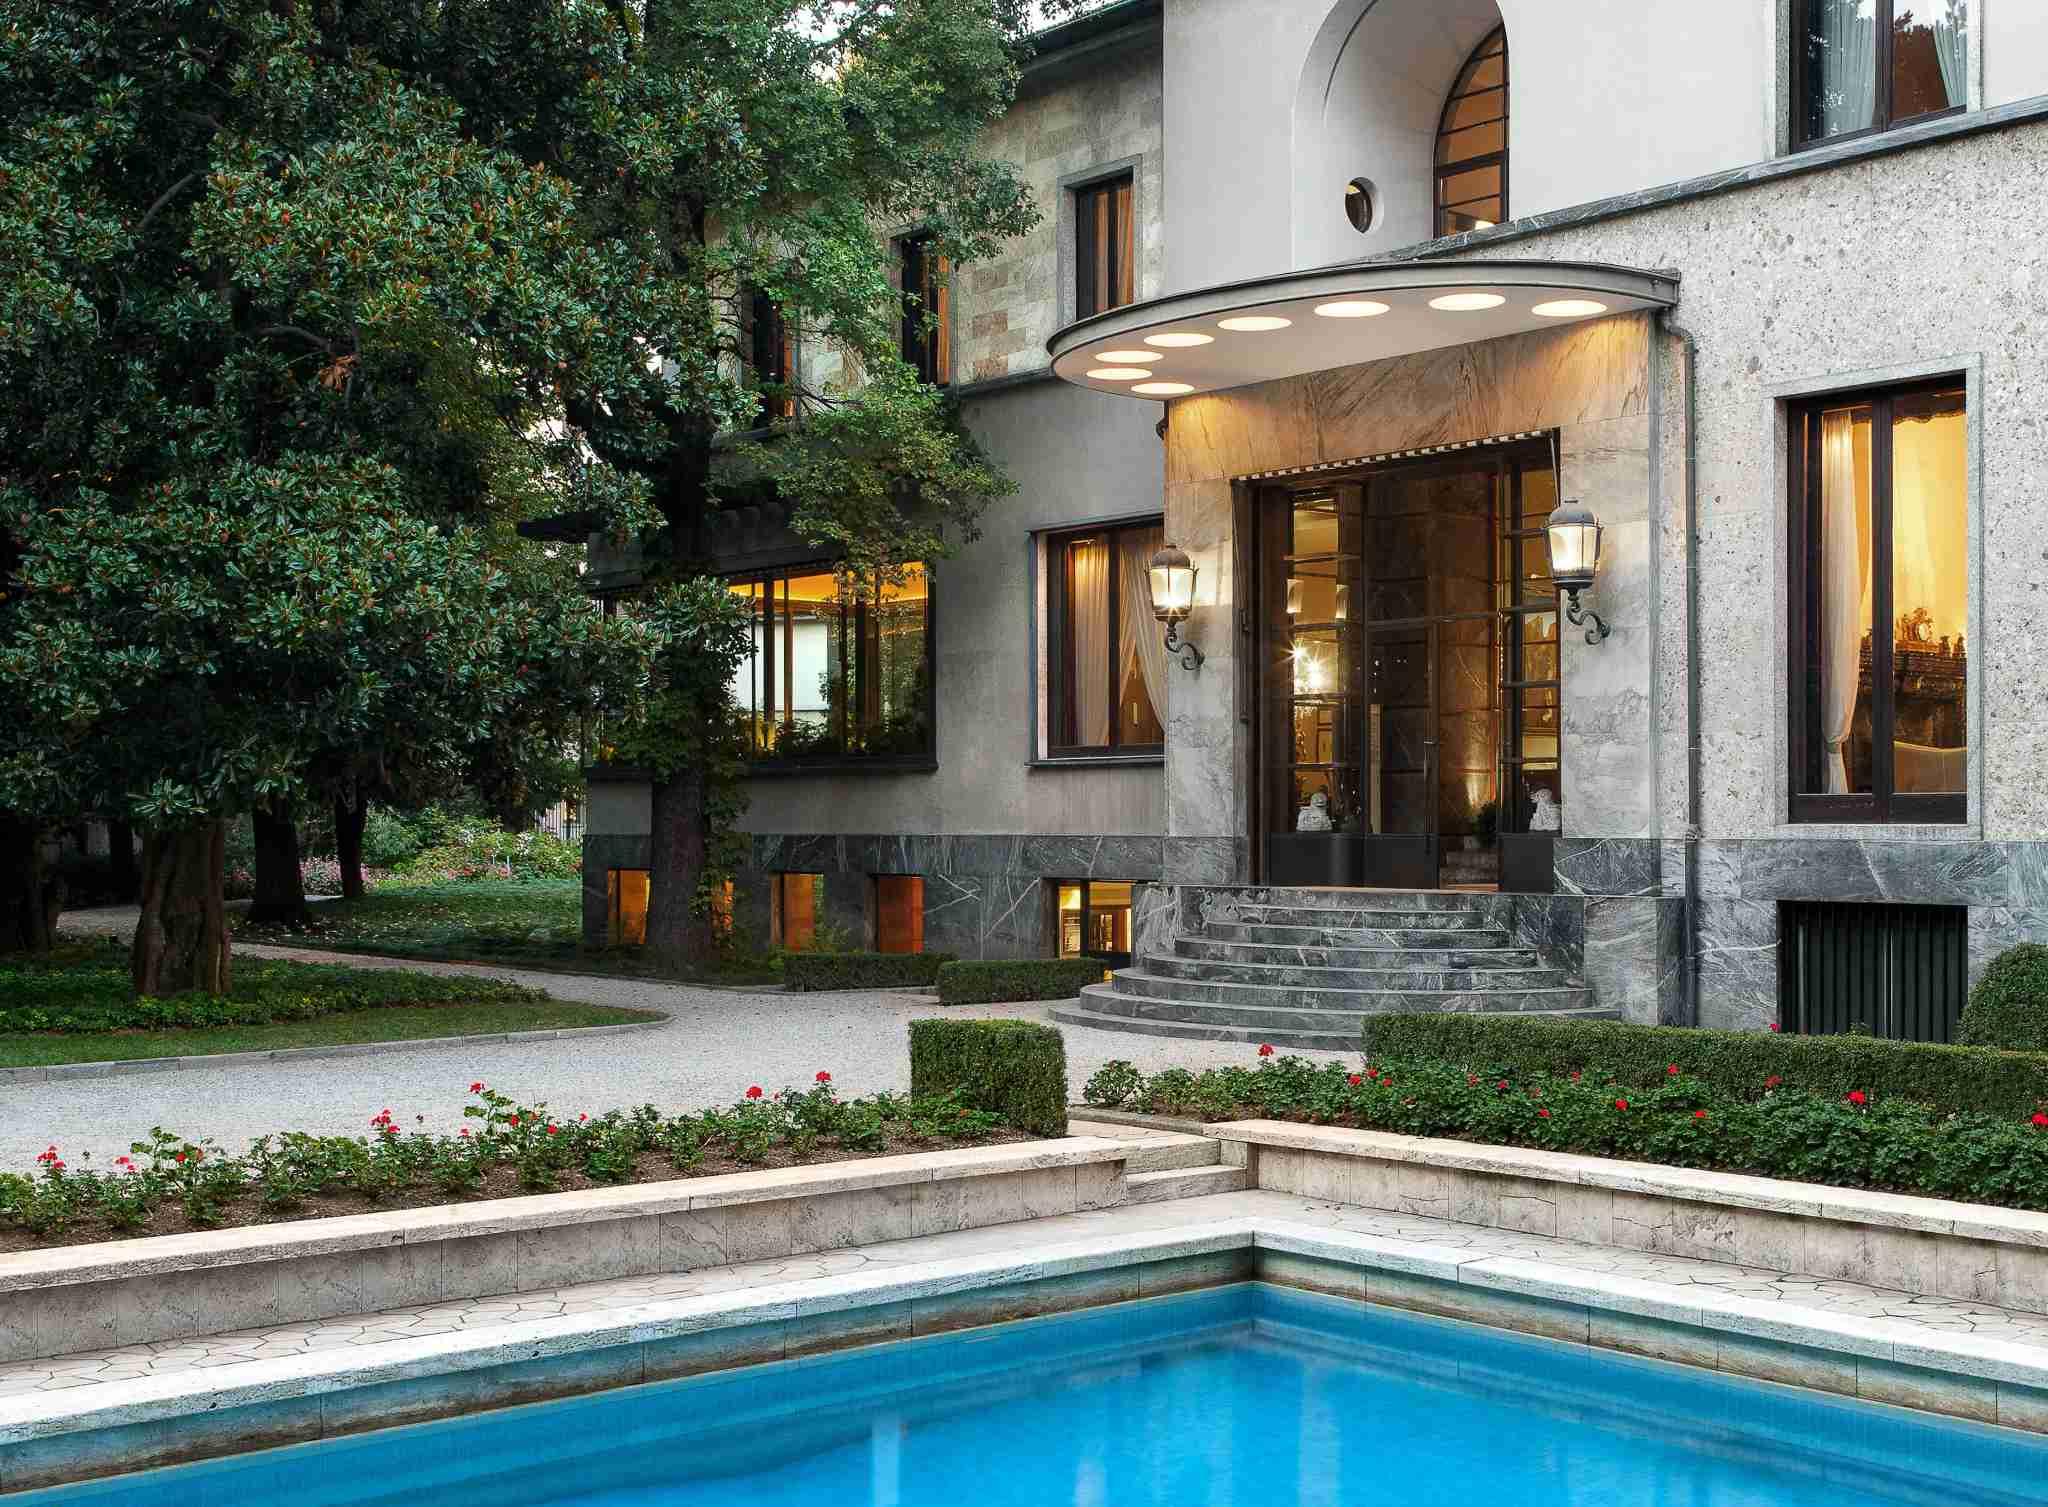 Villa Necchi Campiglio in Milan is a must-visit site for architecture and design lovers. Photo courtesy of FAI.